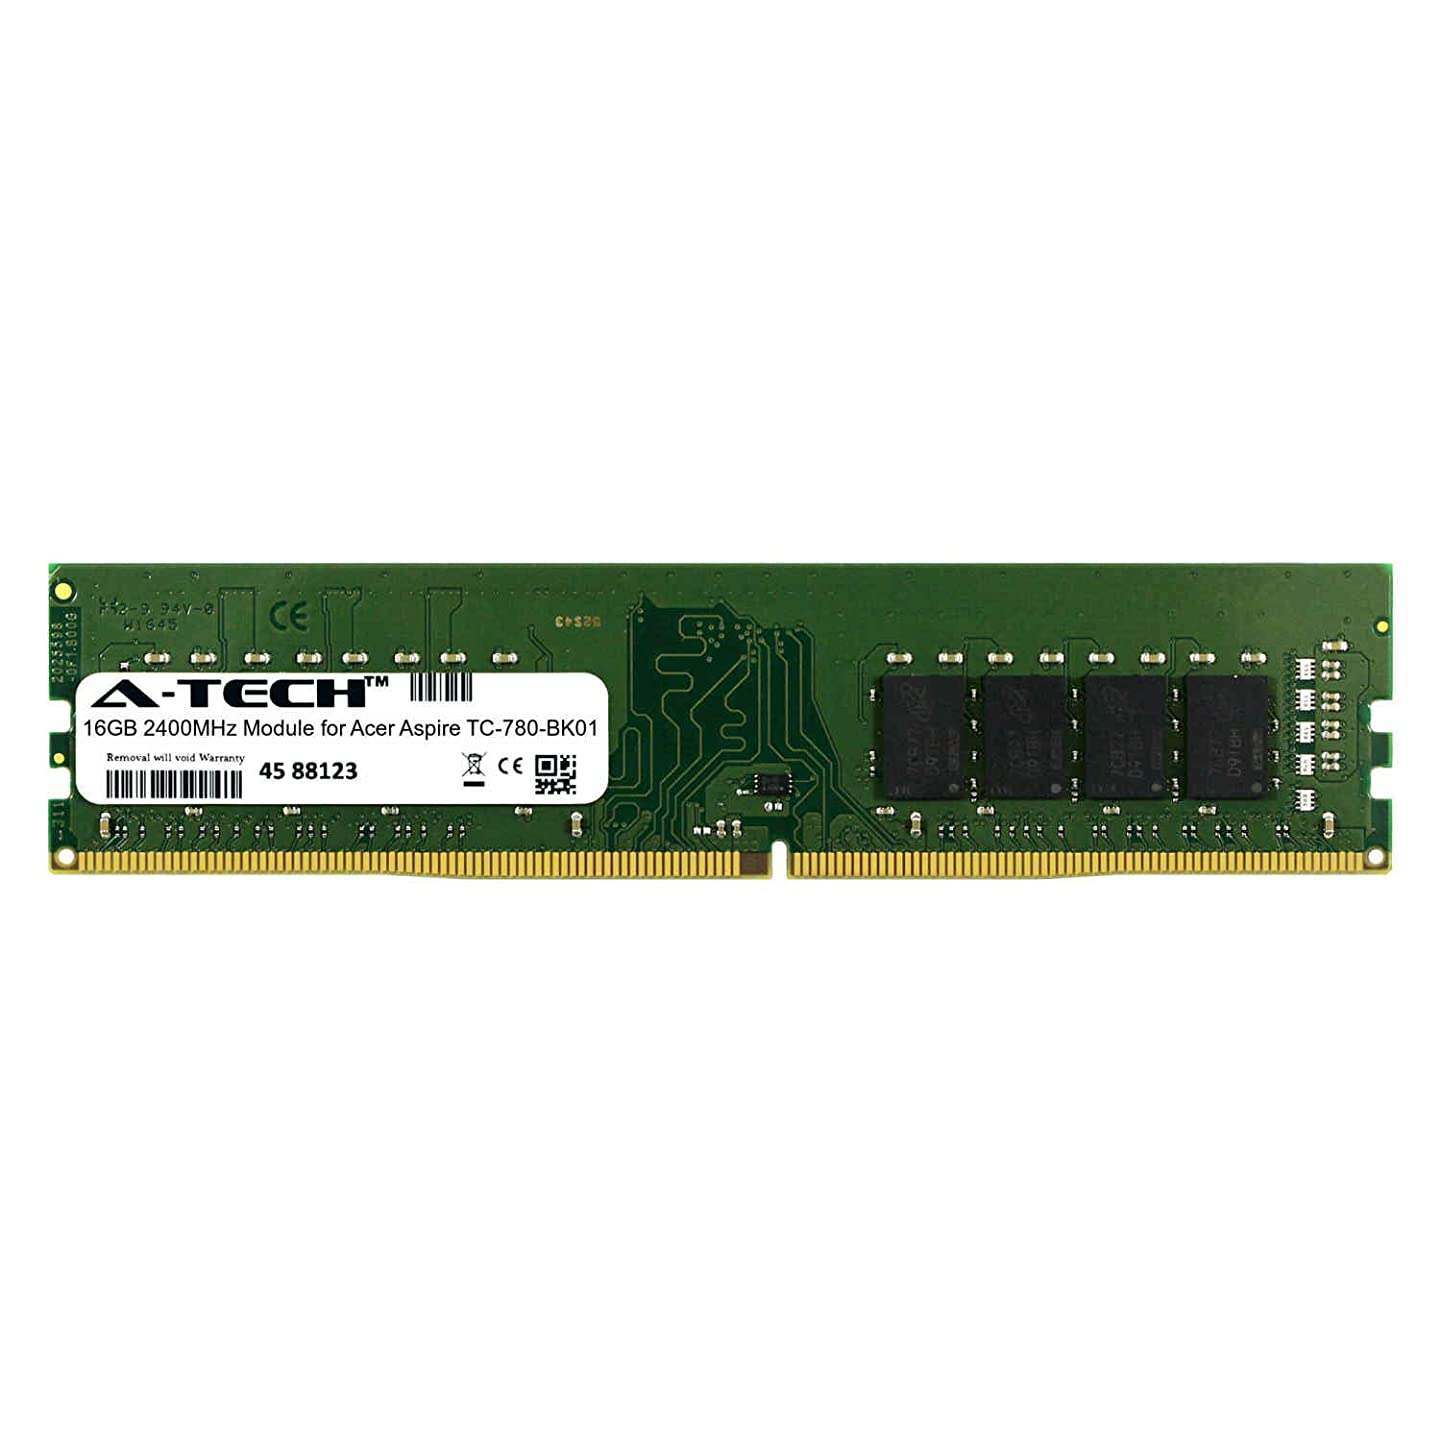 A-Tech 16GB Module for Acer Aspire TC-780-BK01 Desktop & Workstation Motherboard Compatible DDR4 2400Mhz Memory Ram (ATMS267098A25822X1)